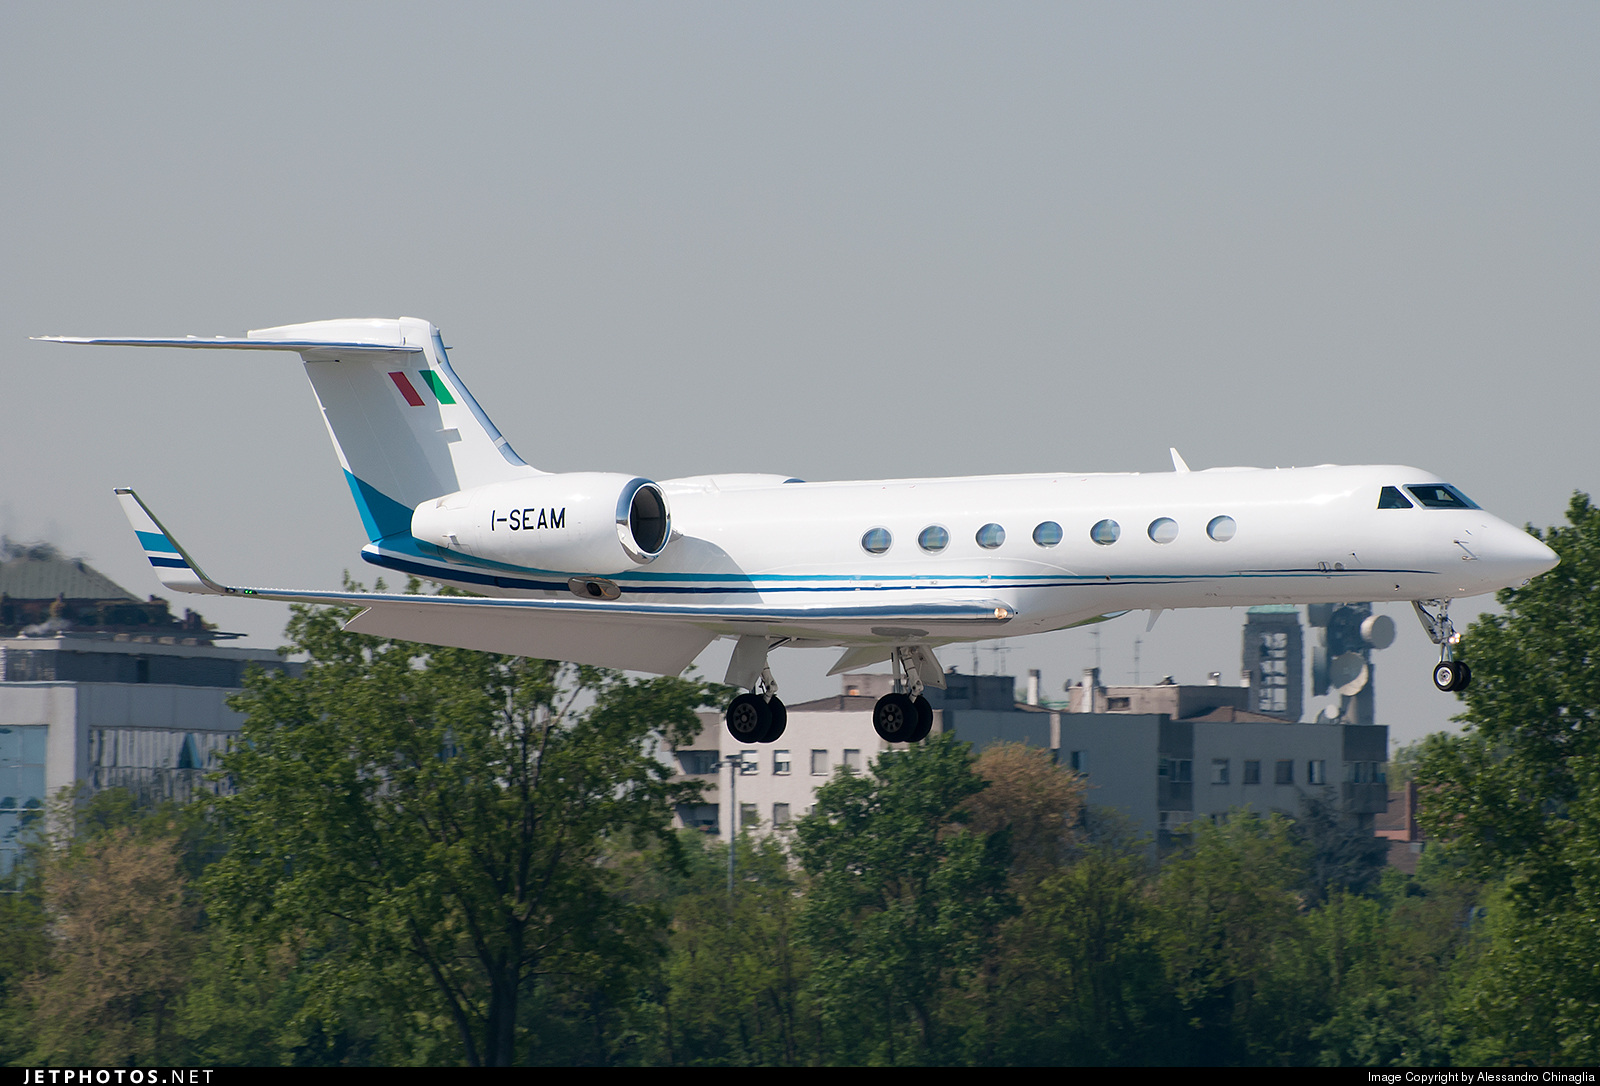 I-SEAM - Gulfstream G550 - SNAM - Servizi Aerei